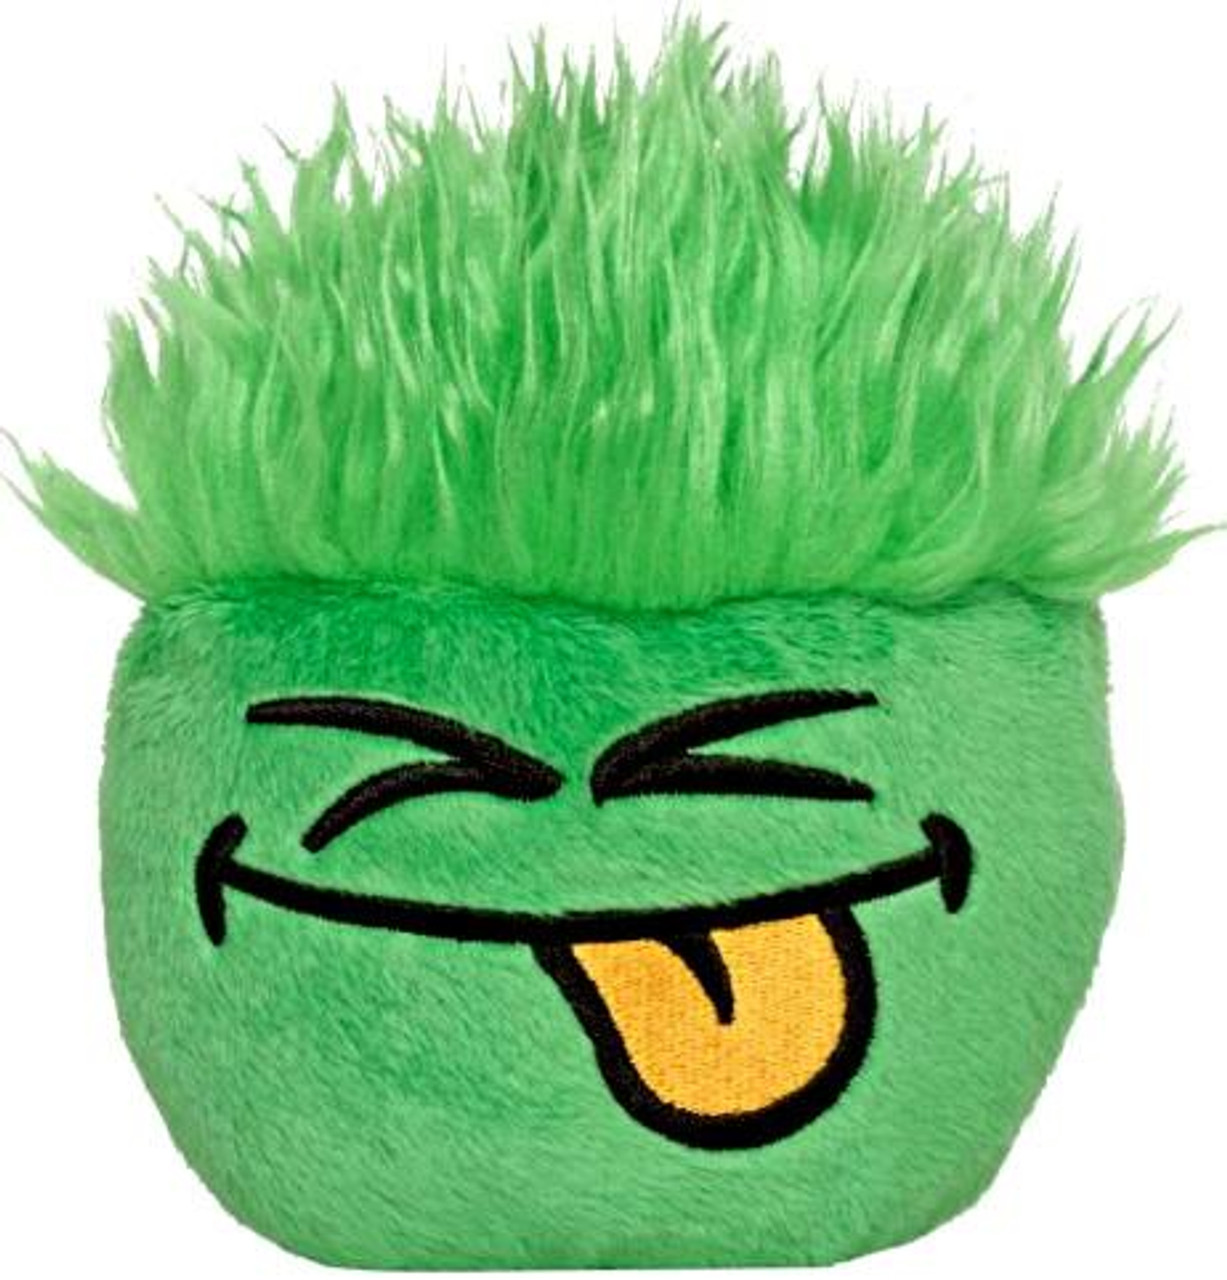 Club Penguin Series 11 Green Puffle 4-Inch Plush